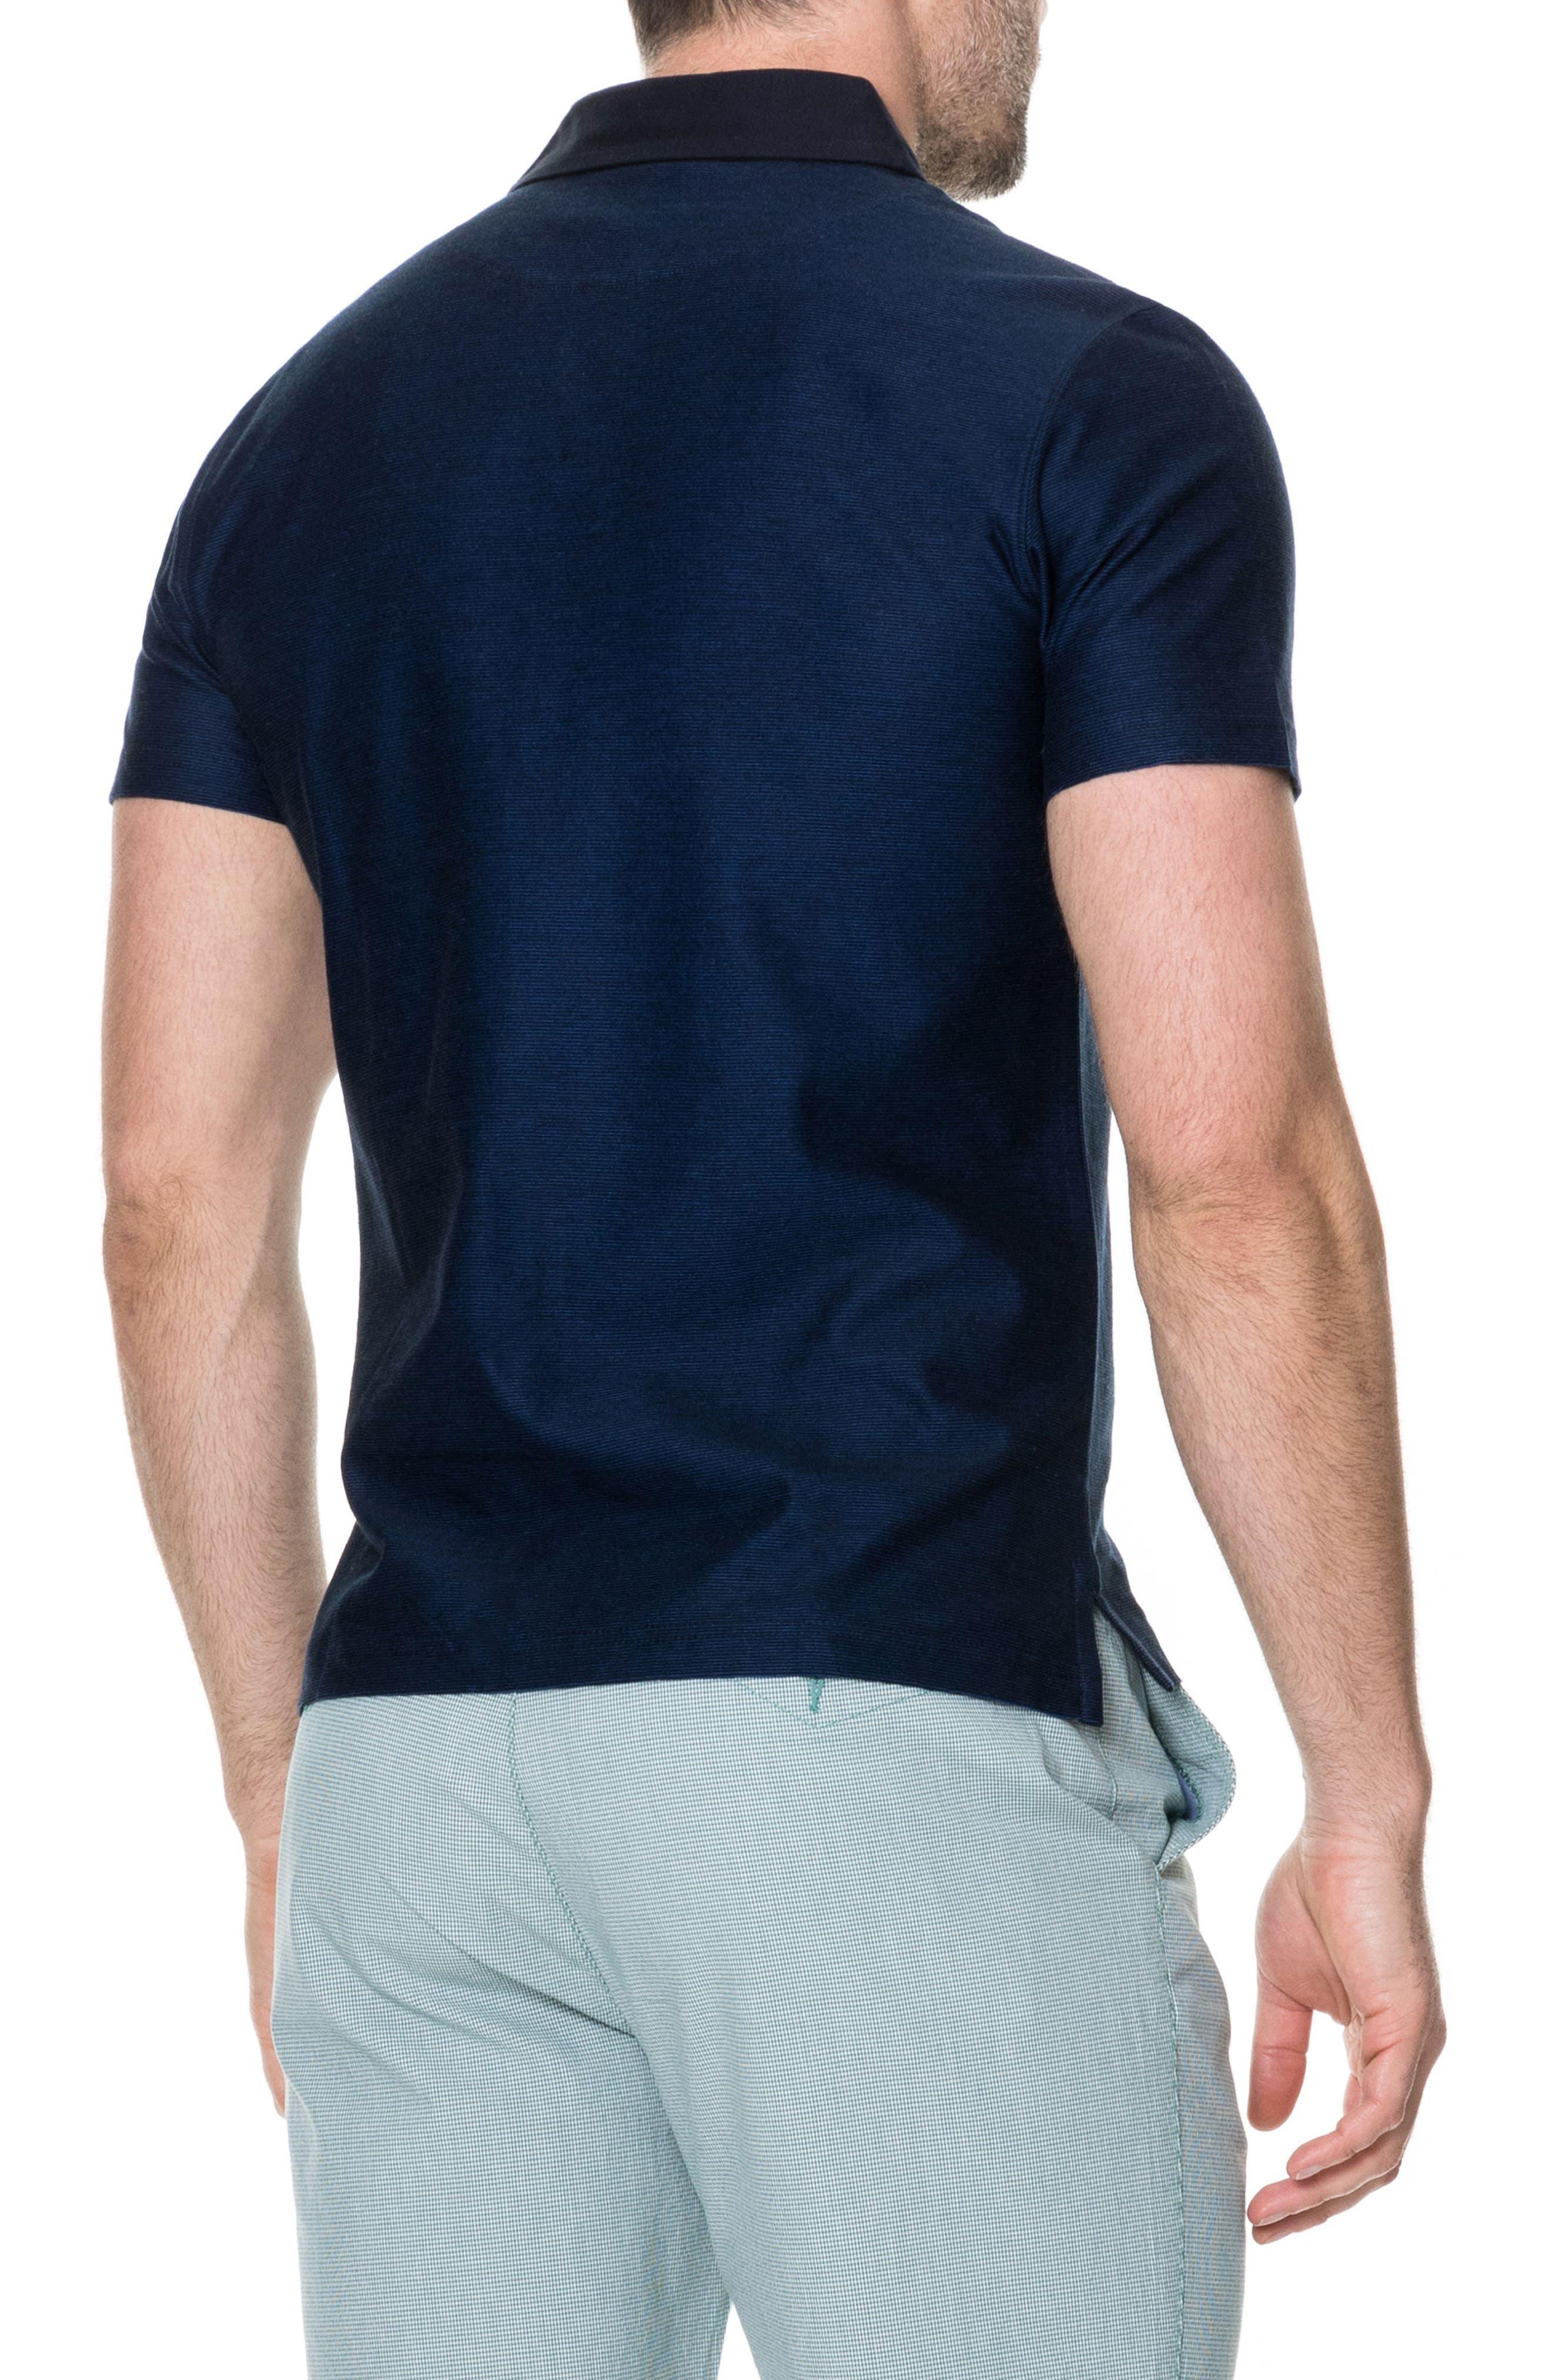 Caplestone Regular Fit Polo,                             Alternate thumbnail 2, color,                             401